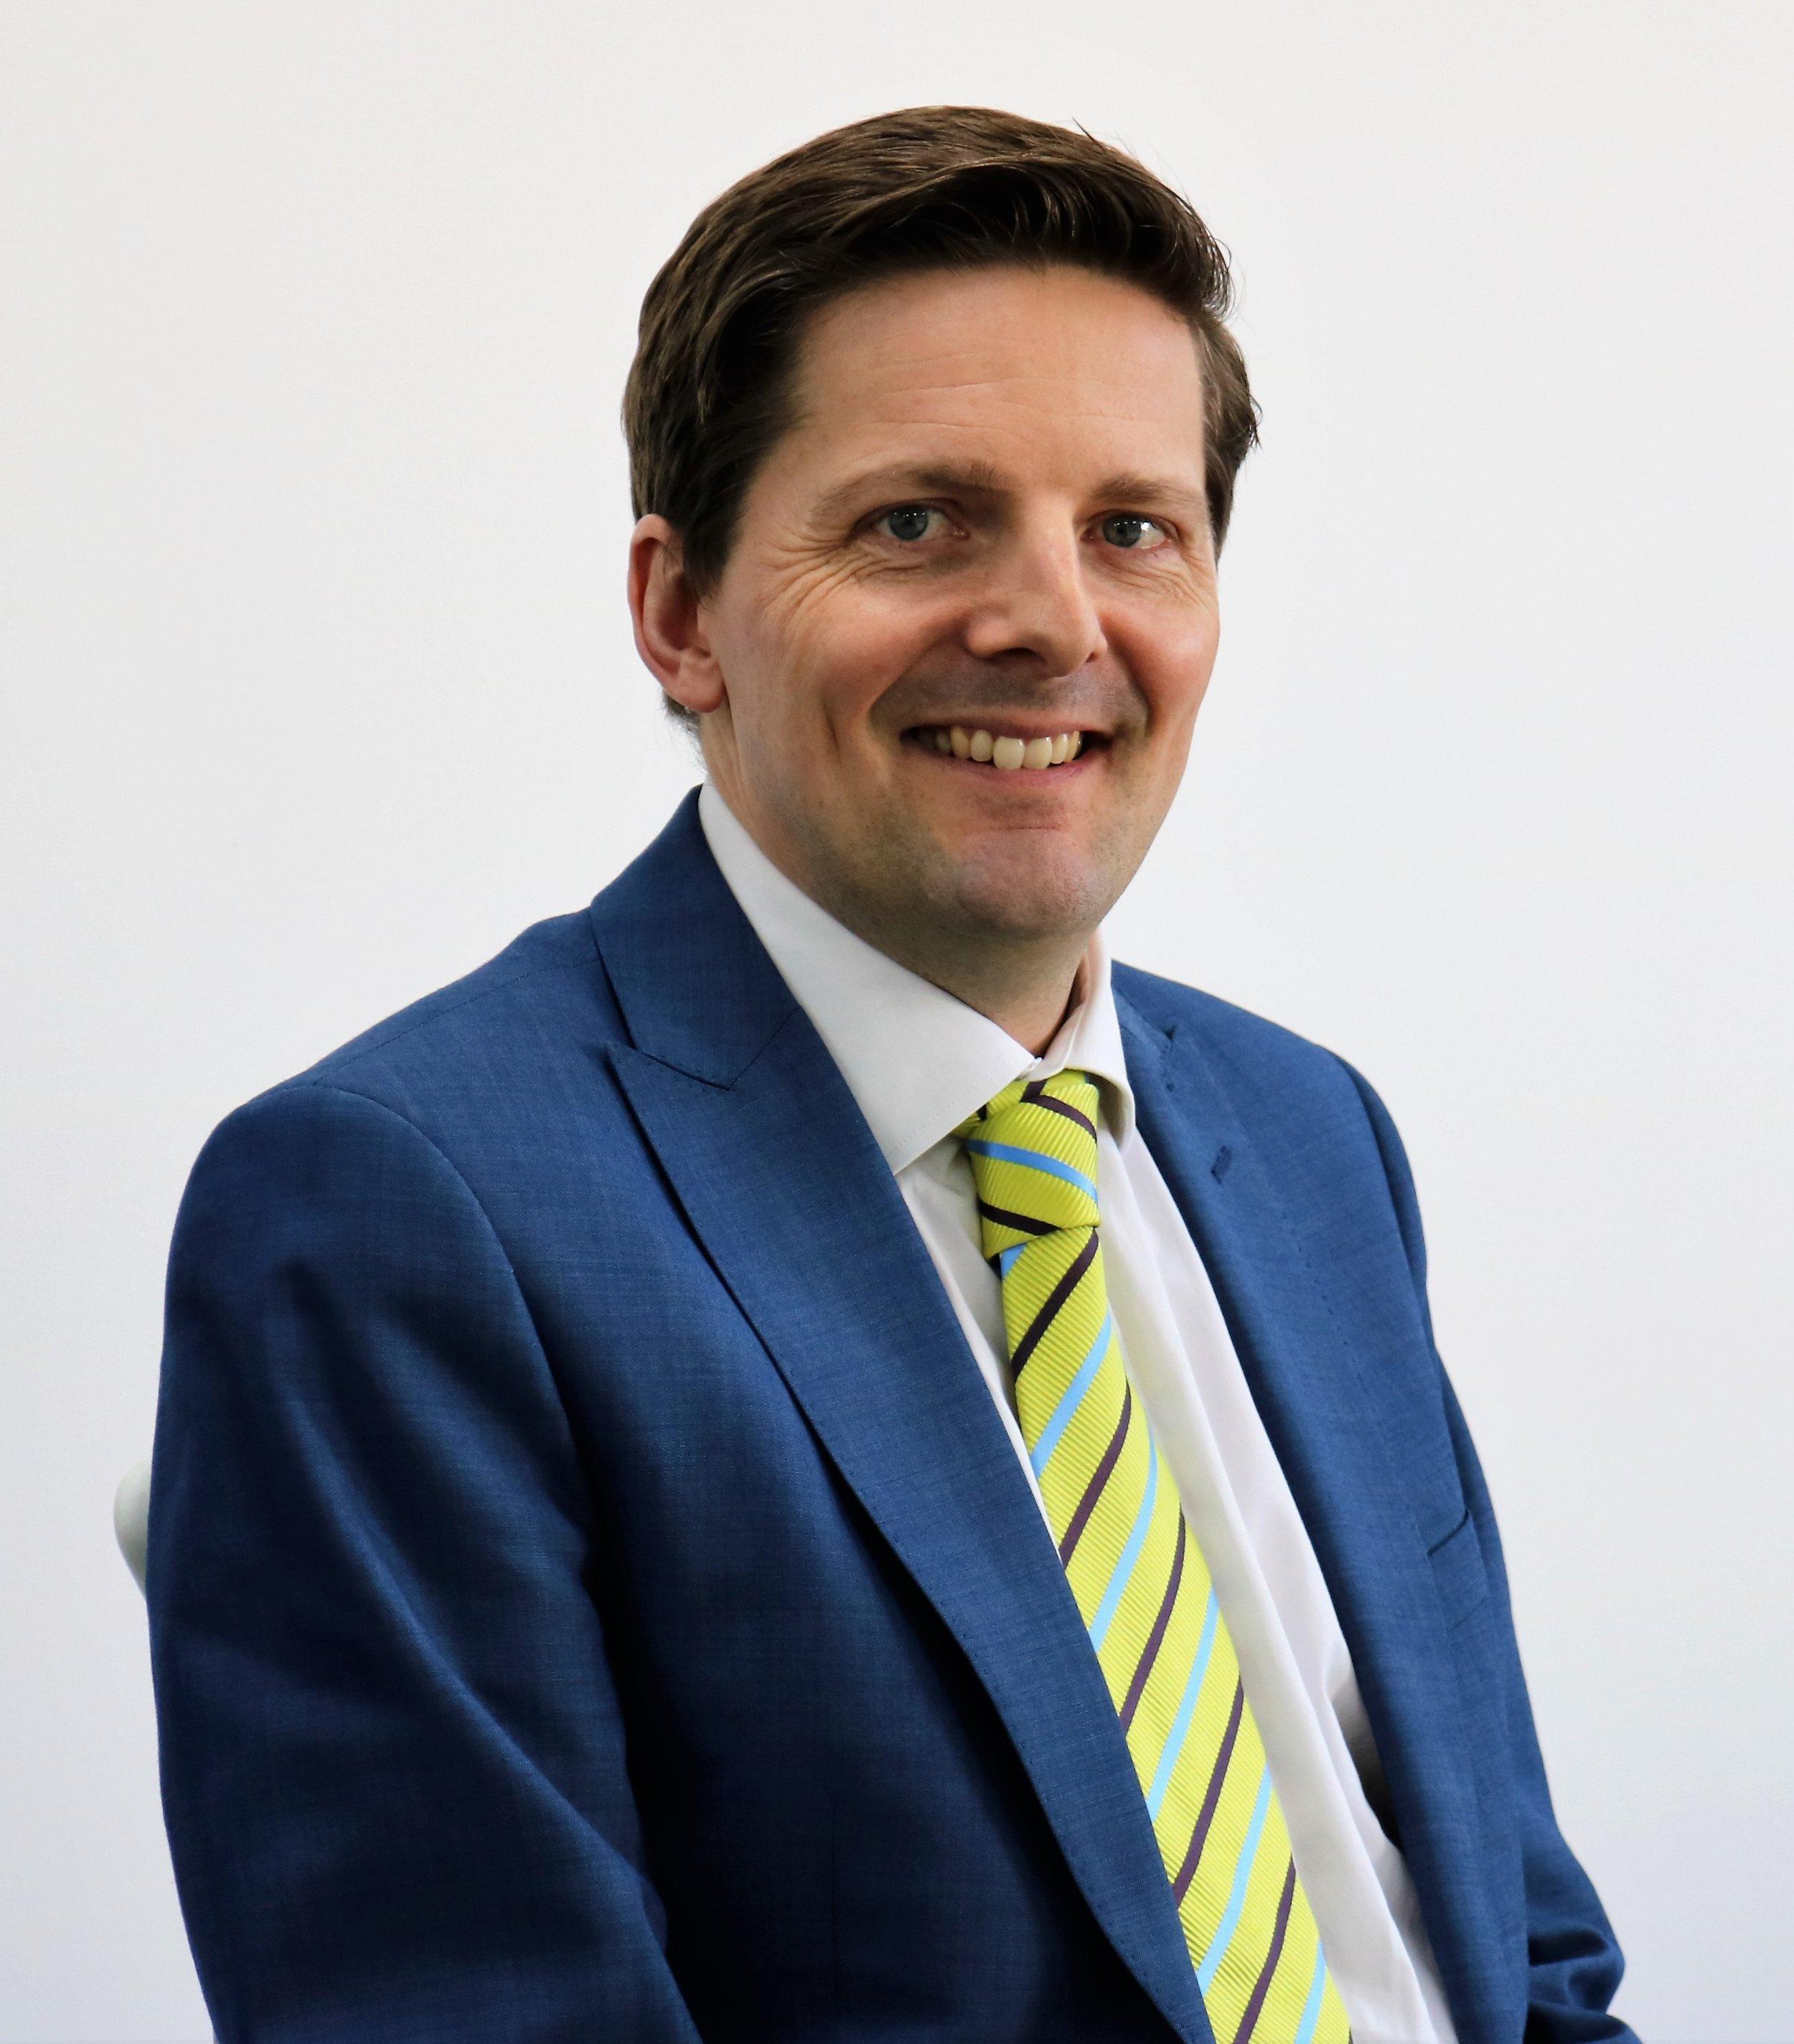 Advocate Andrew Pinel, Partner